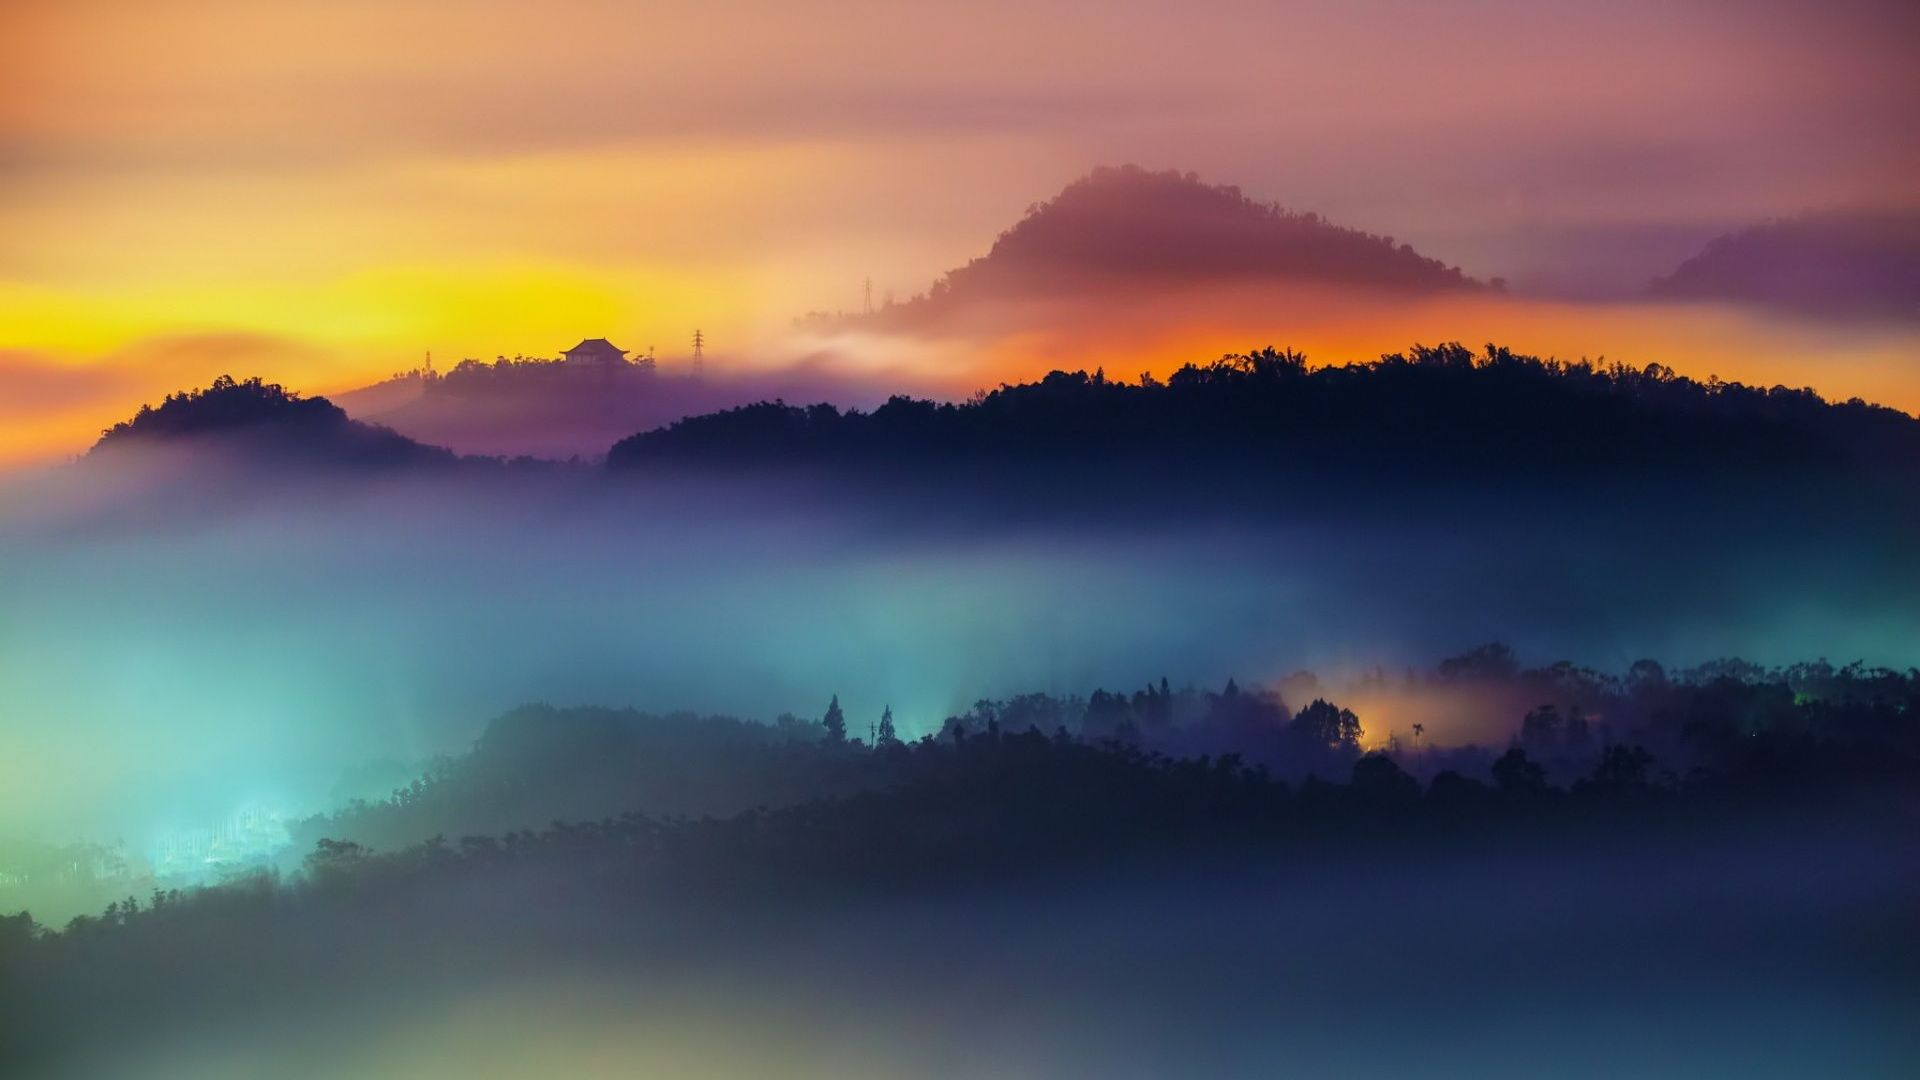 Wallpaper Anime 3d Hd Hintergrundbilder Berge Nebel Dunst Sonnenuntergang